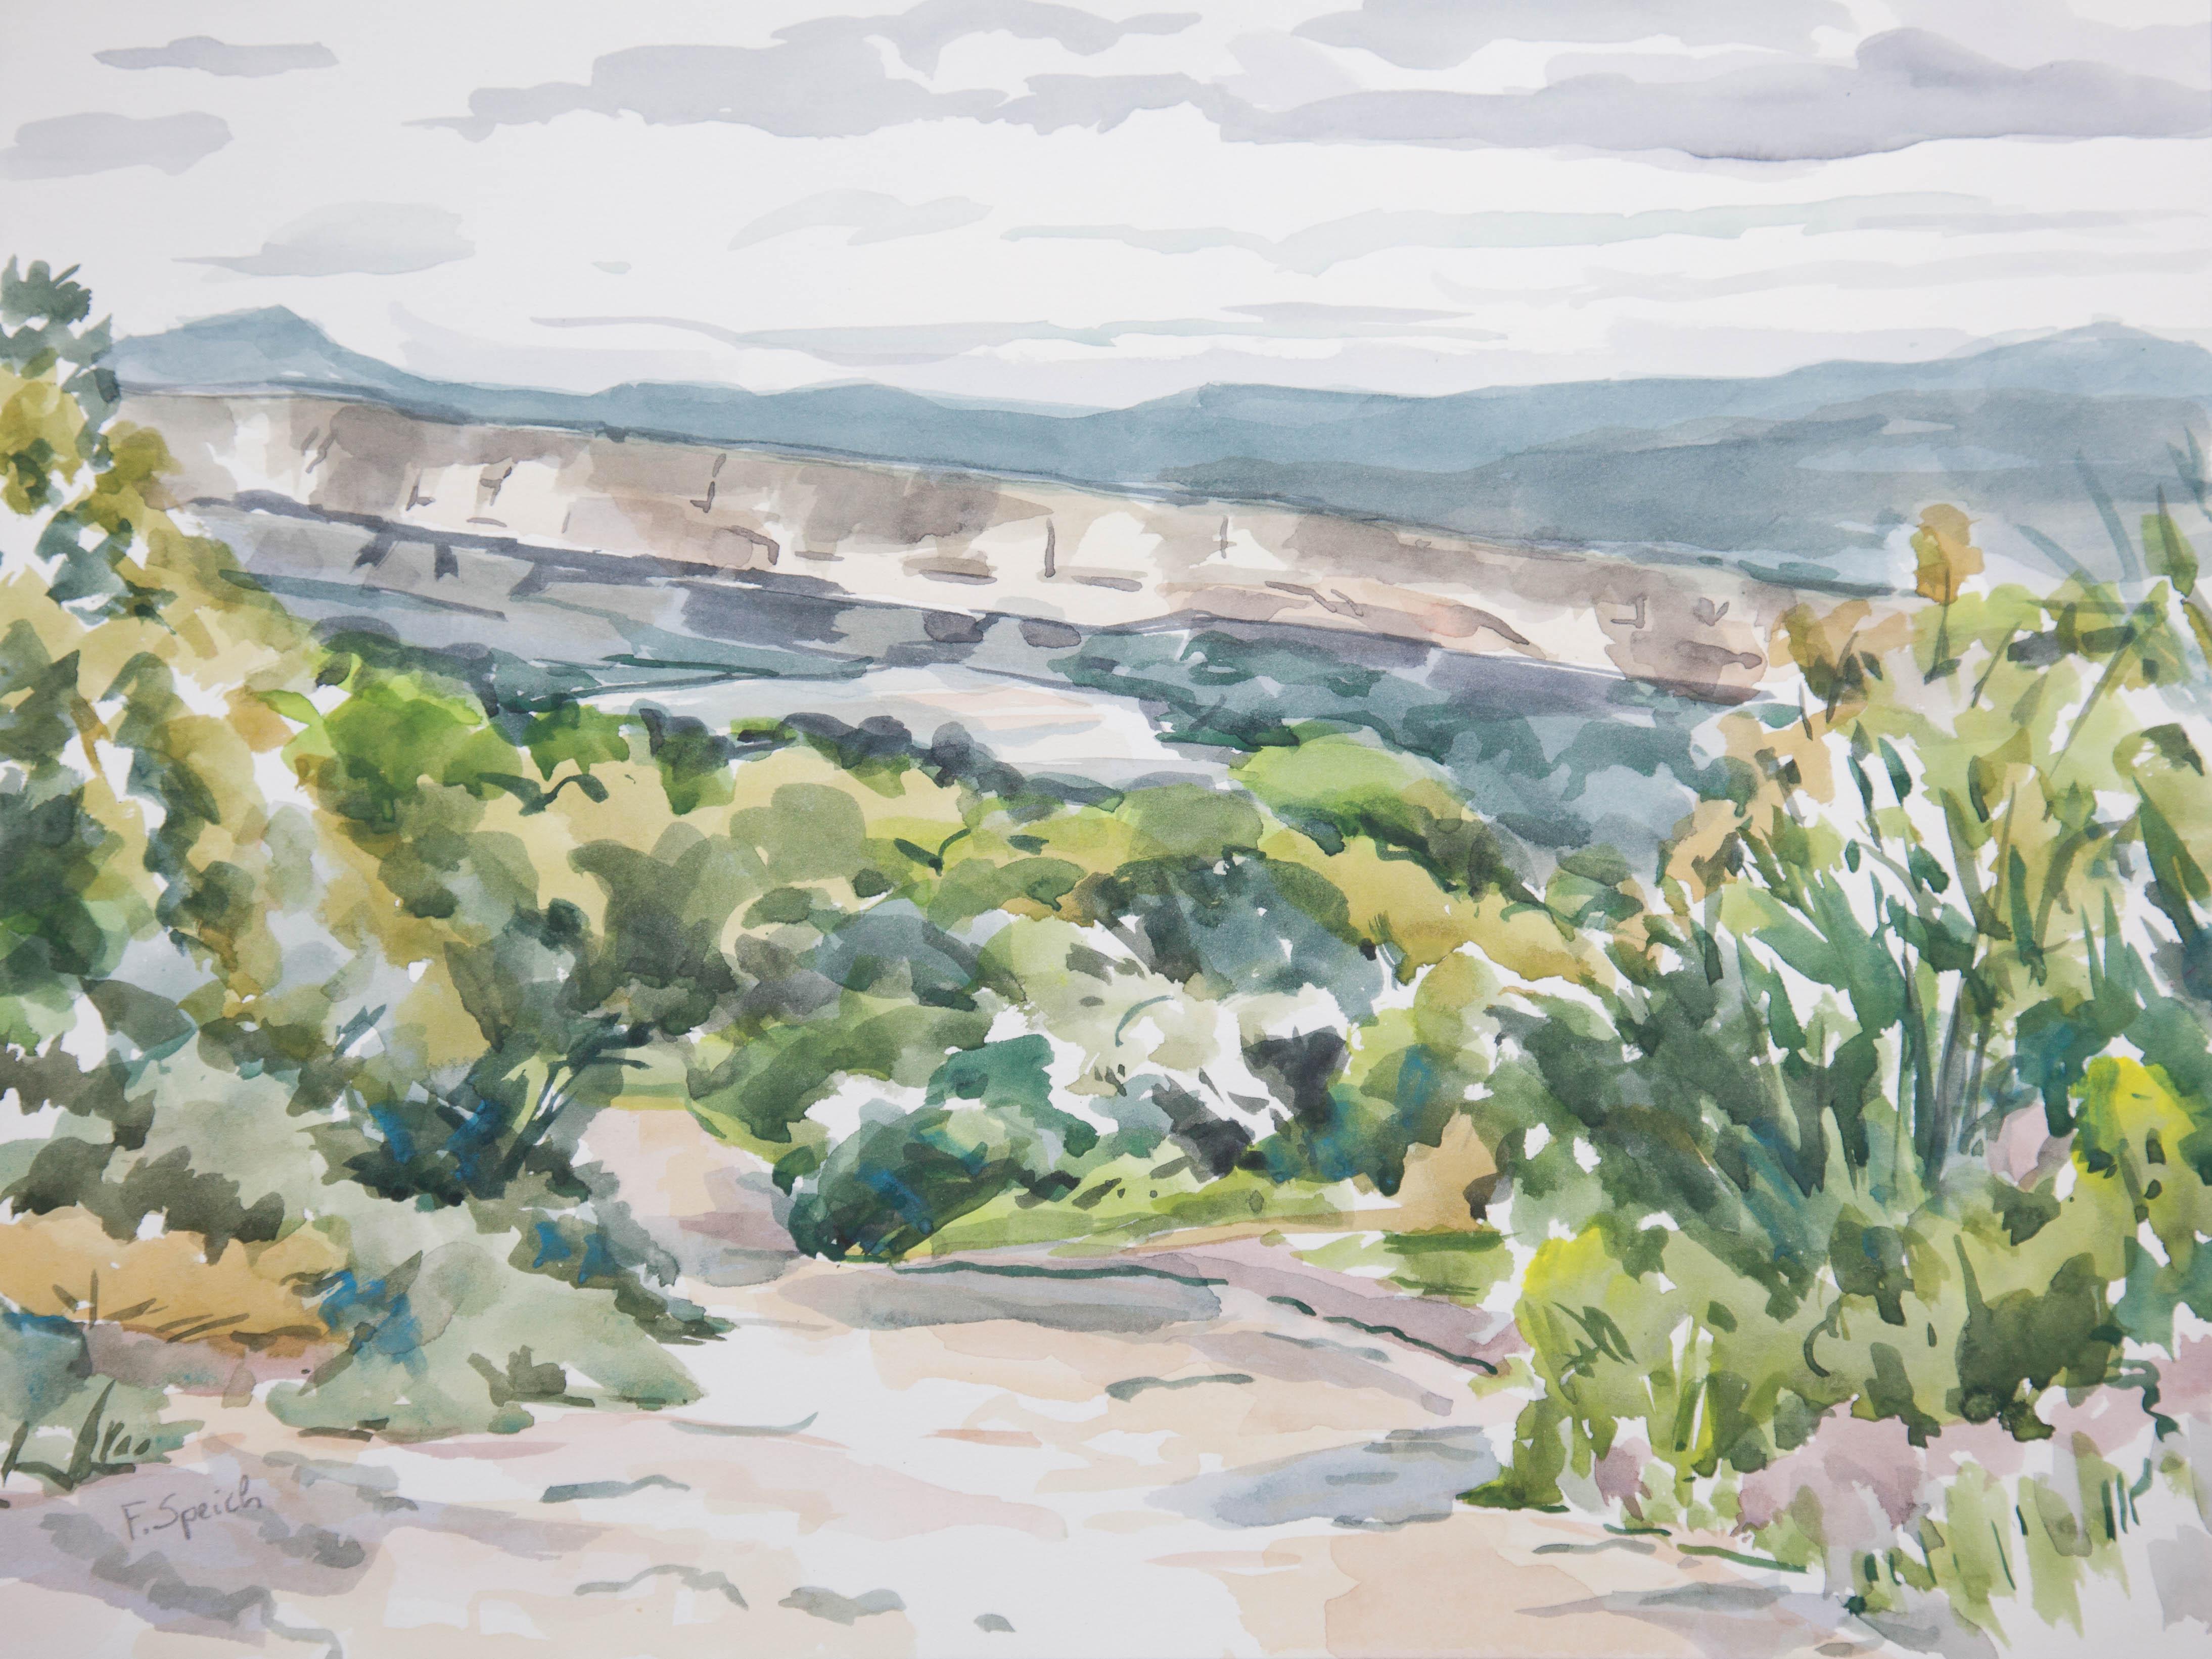 Luberon - Falaise de la Madeleine